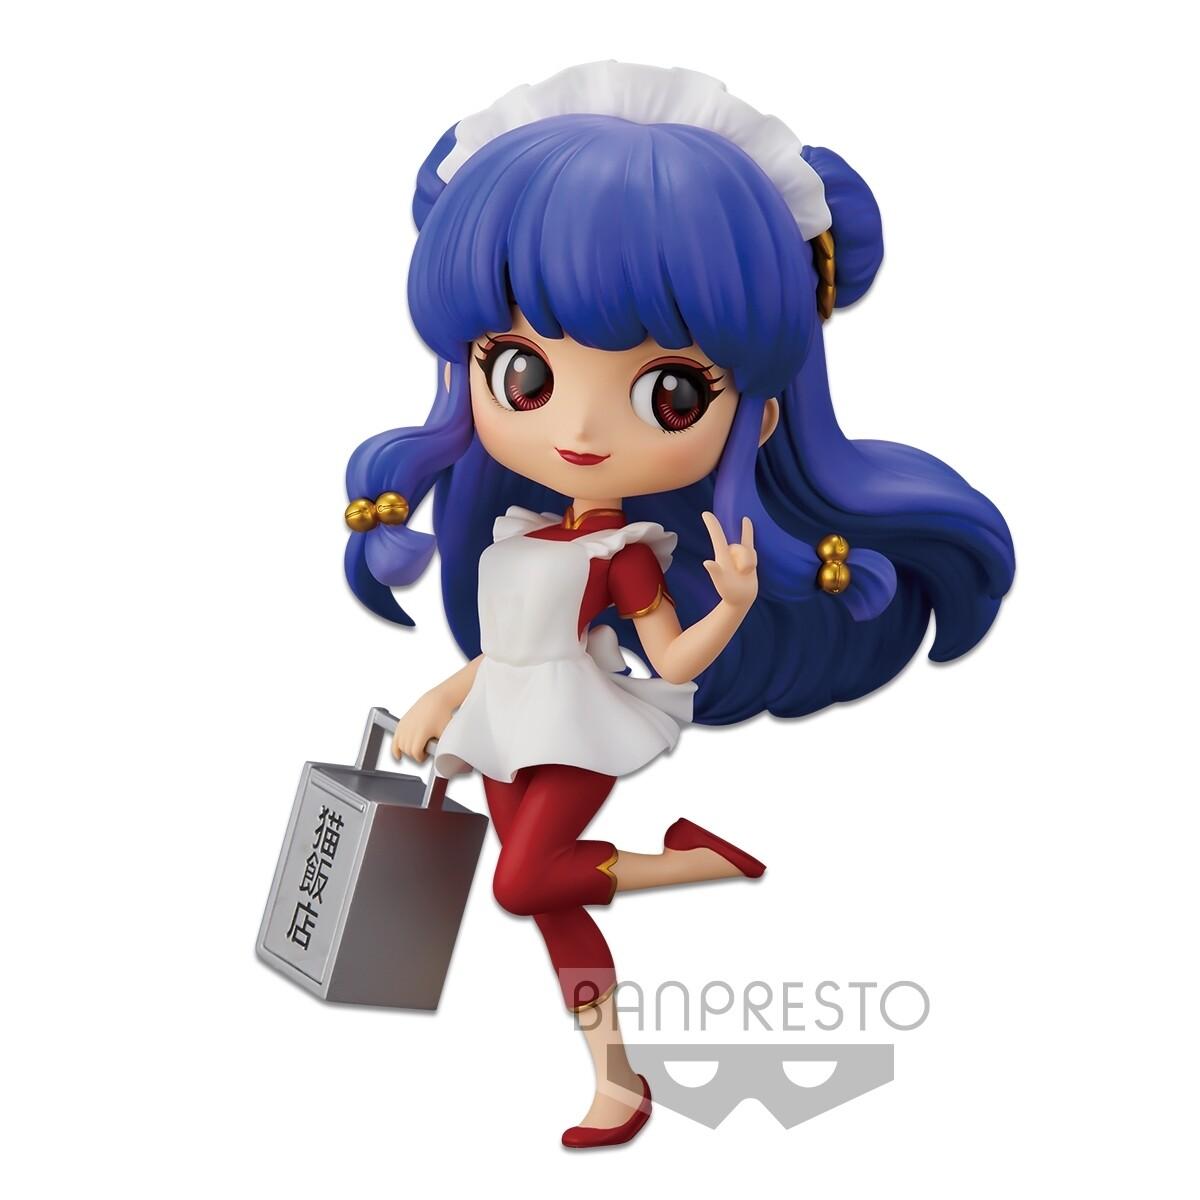 PRE-ORDER Banpresto Ranma 1/2 Q Posket Shampoo Ver. A